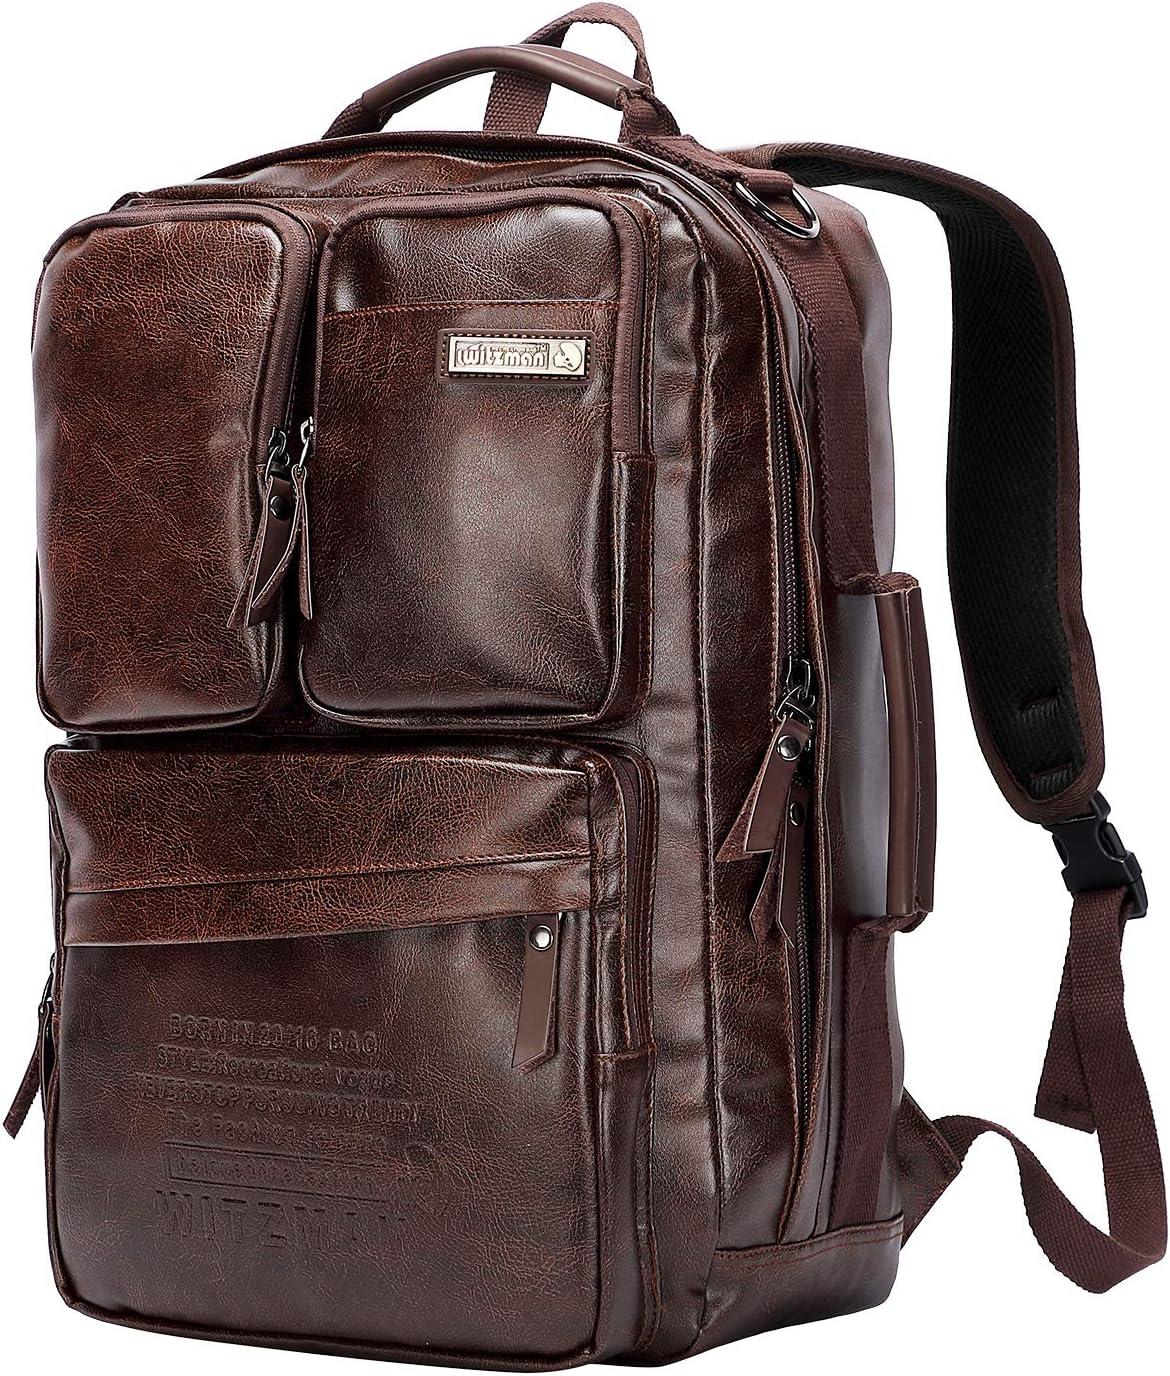 WITZMAN Men Travel Backpack Vintage Laptop Bag Rucksack Casual Daypack Convertible Duffel Knapsack A6631 Nut Brown